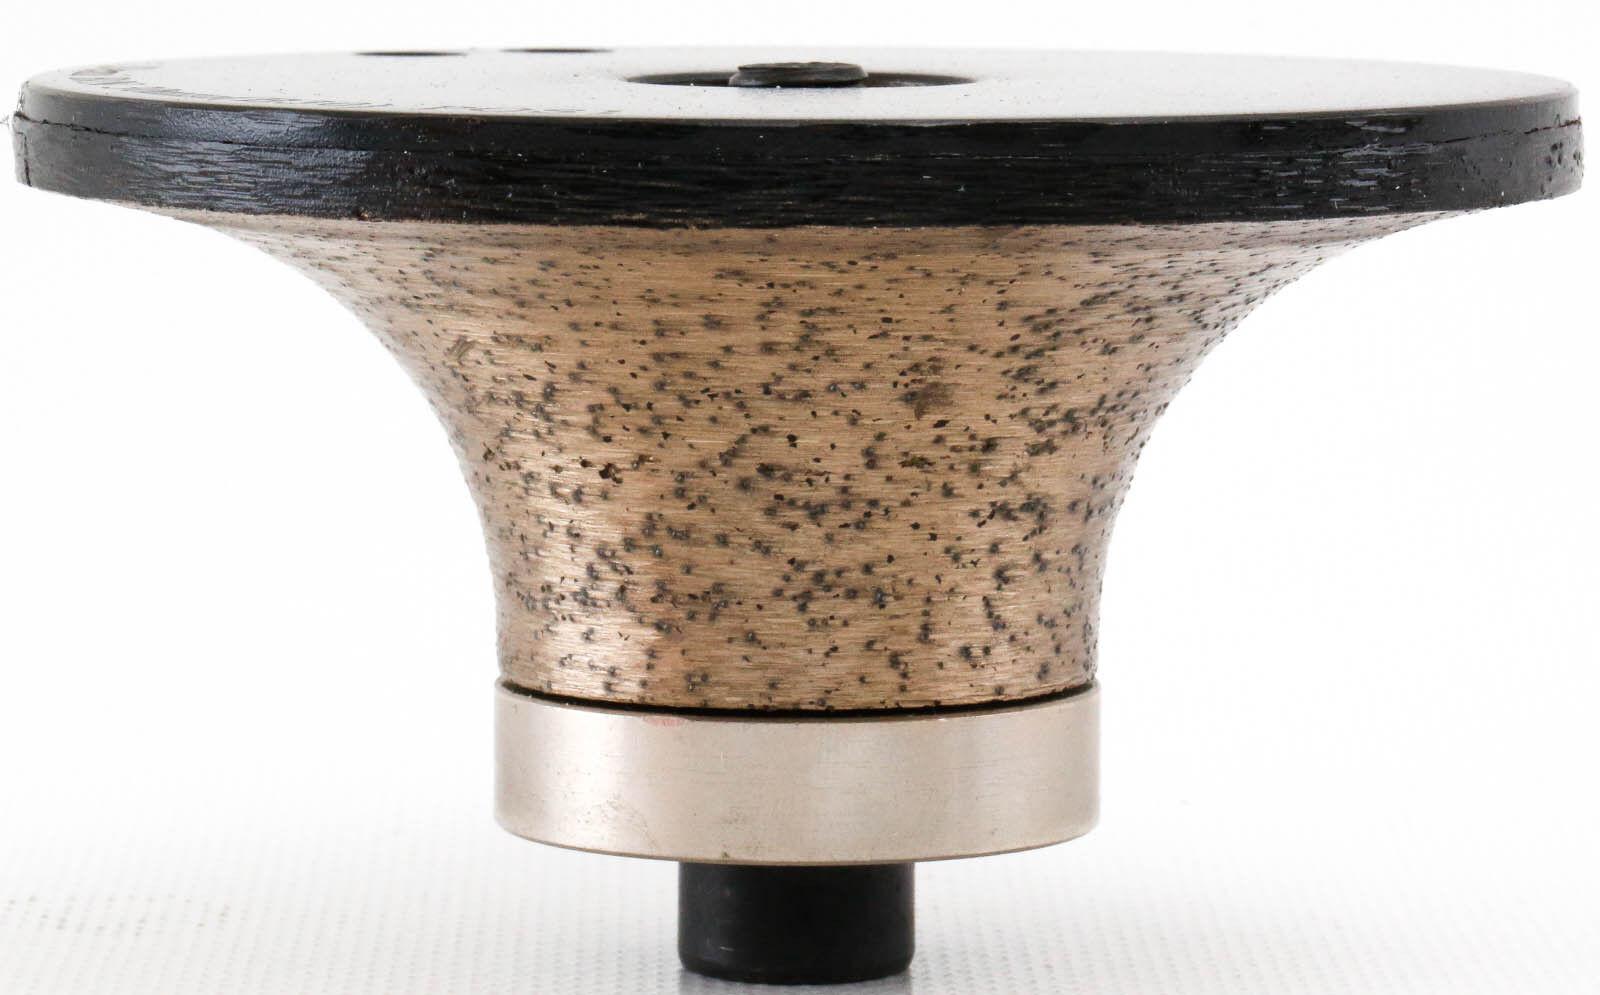 Diamond Router Bit B-20mm Bull Nose Granite Continuous Rim 3 4 Inch Profile 2cm